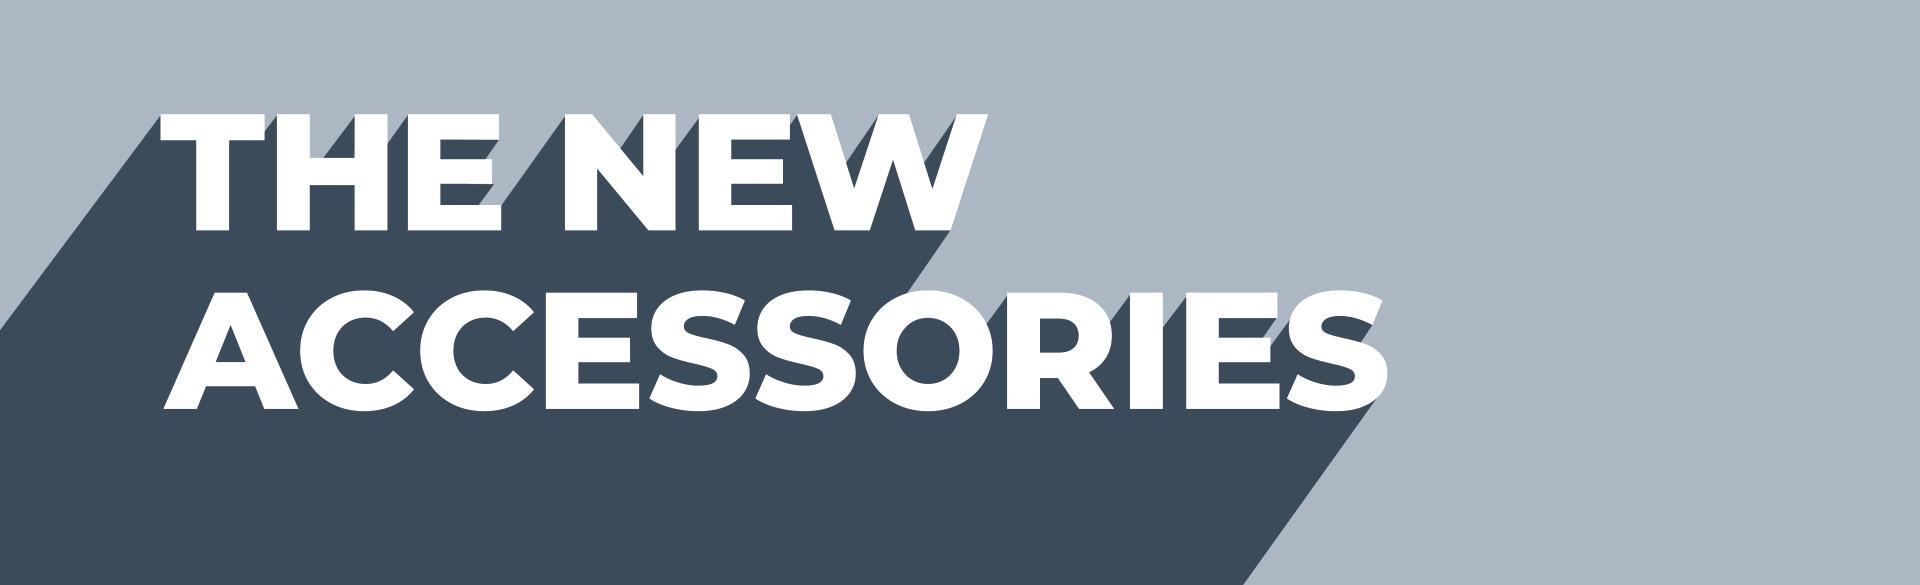 l10-distributors-accessories